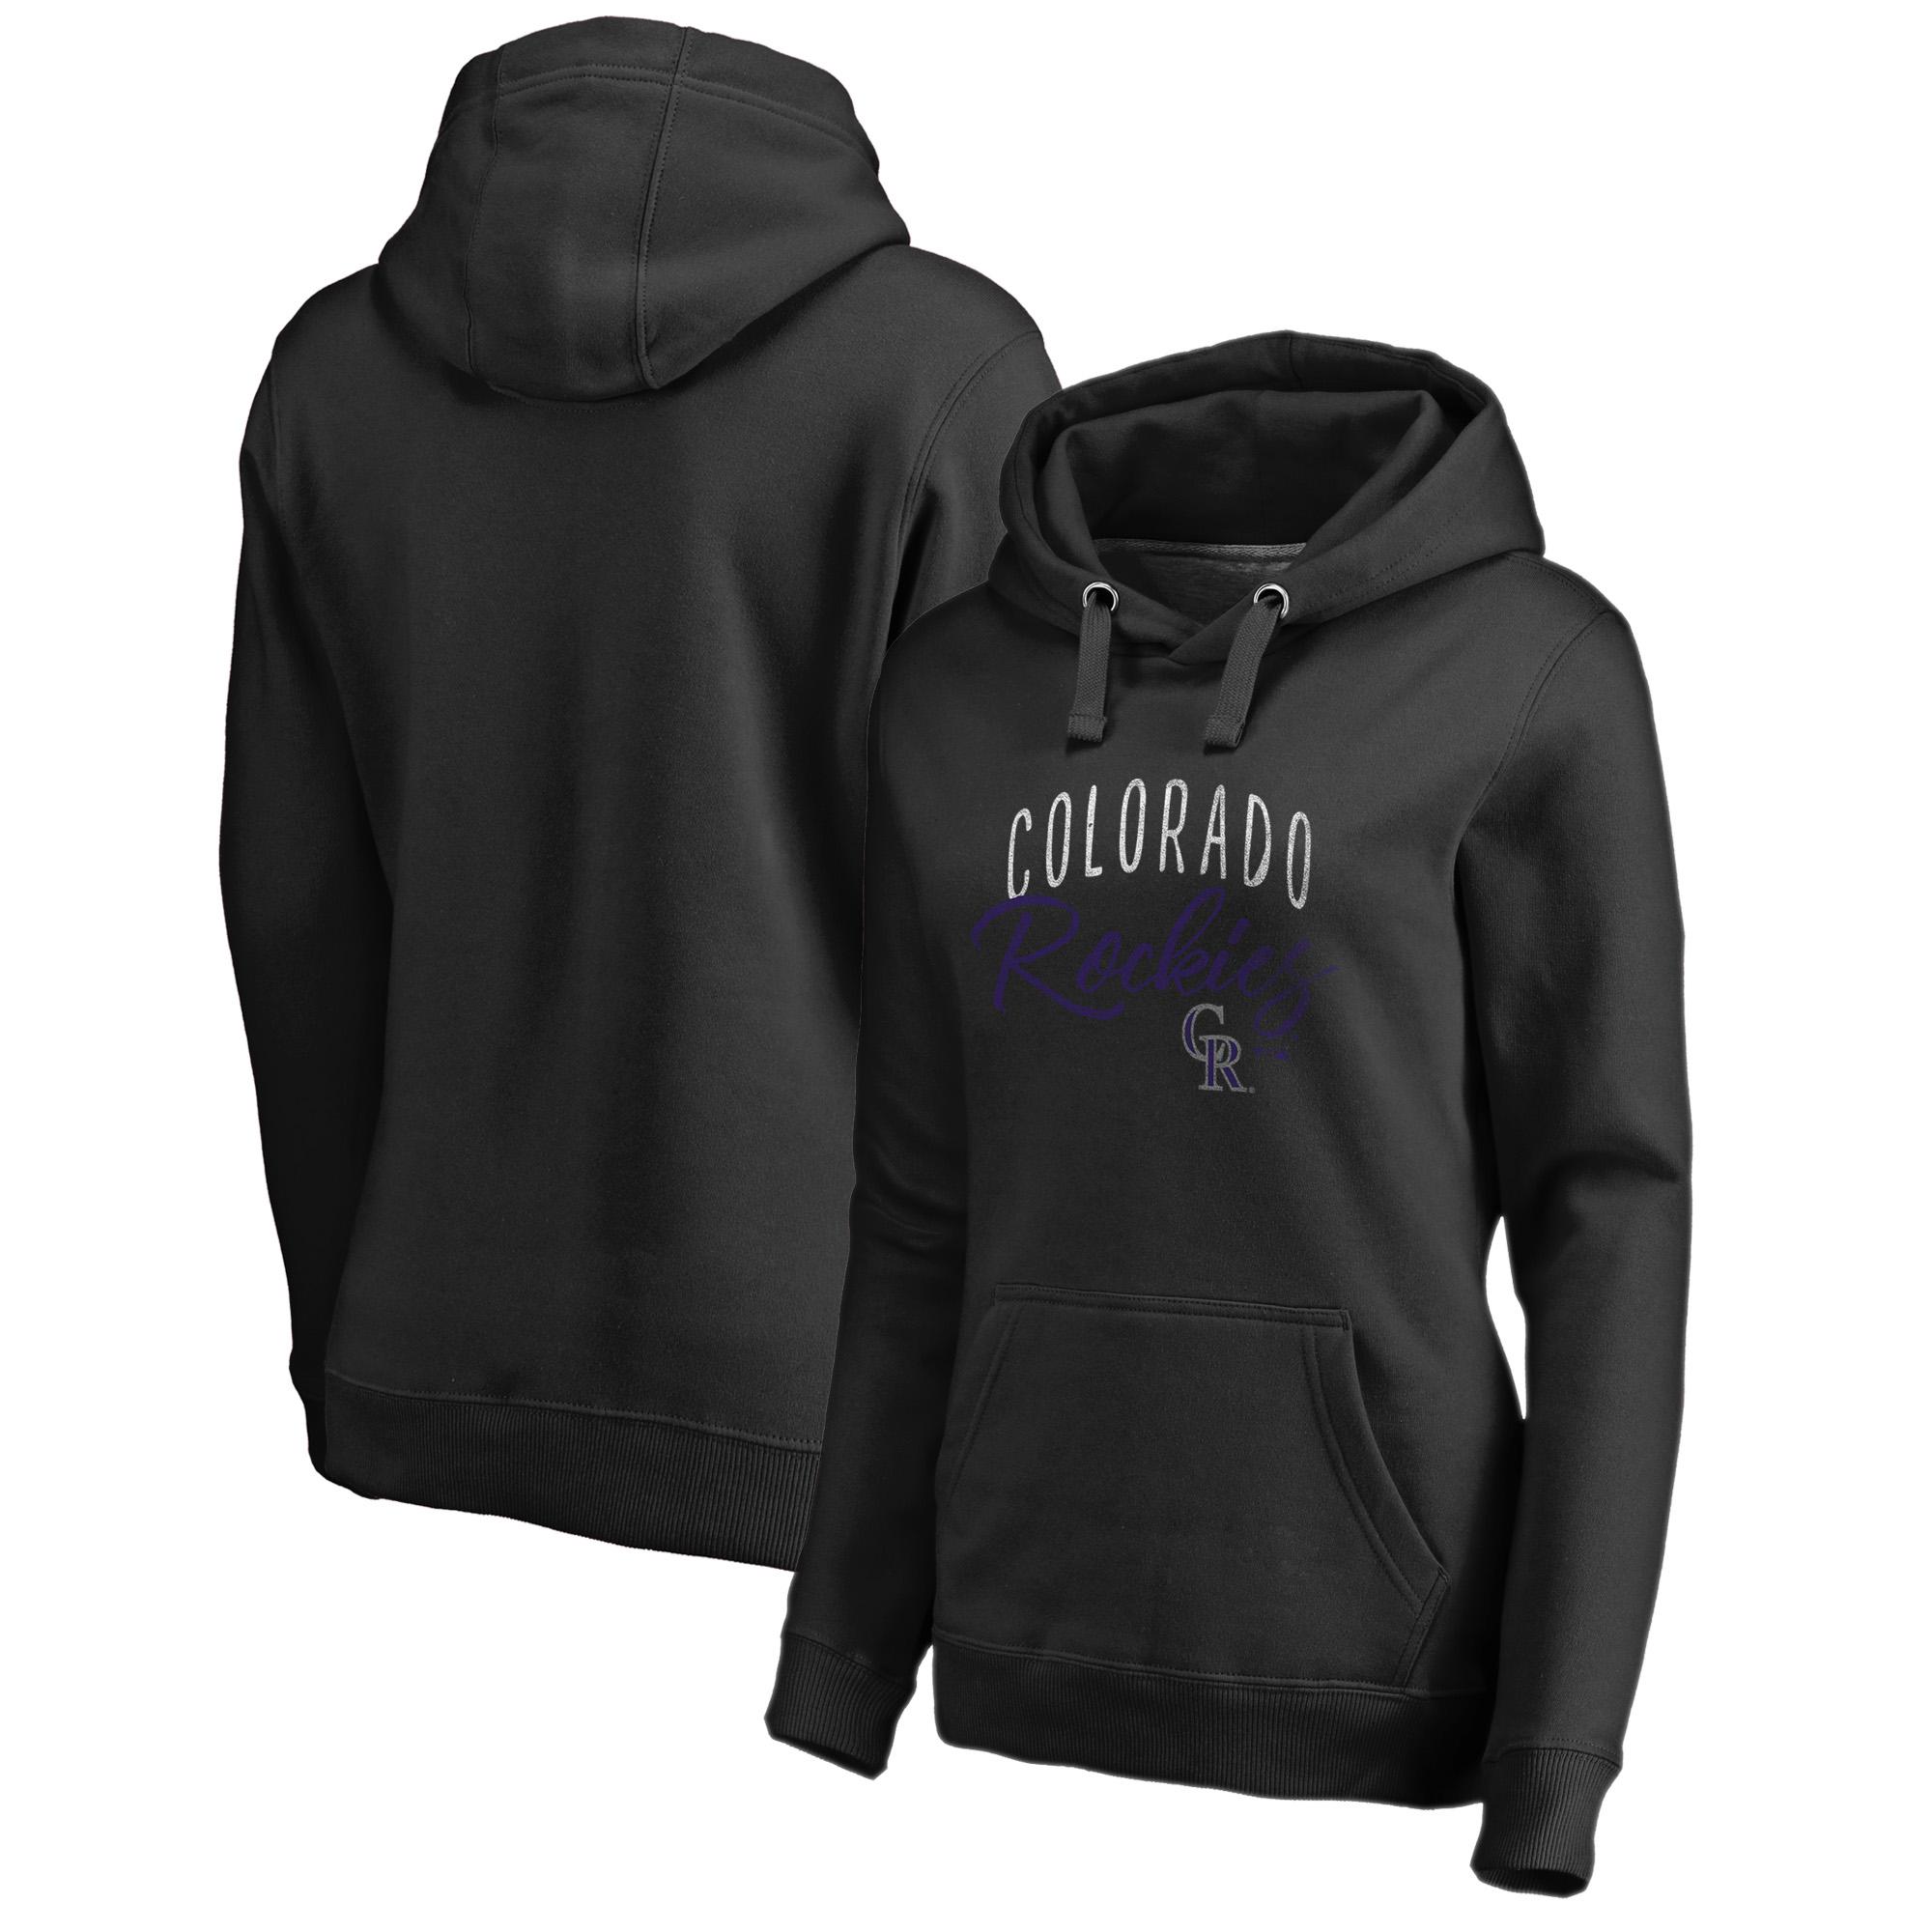 Colorado Rockies Fanatics Branded Women's Graceful Pullover Hoodie - Black